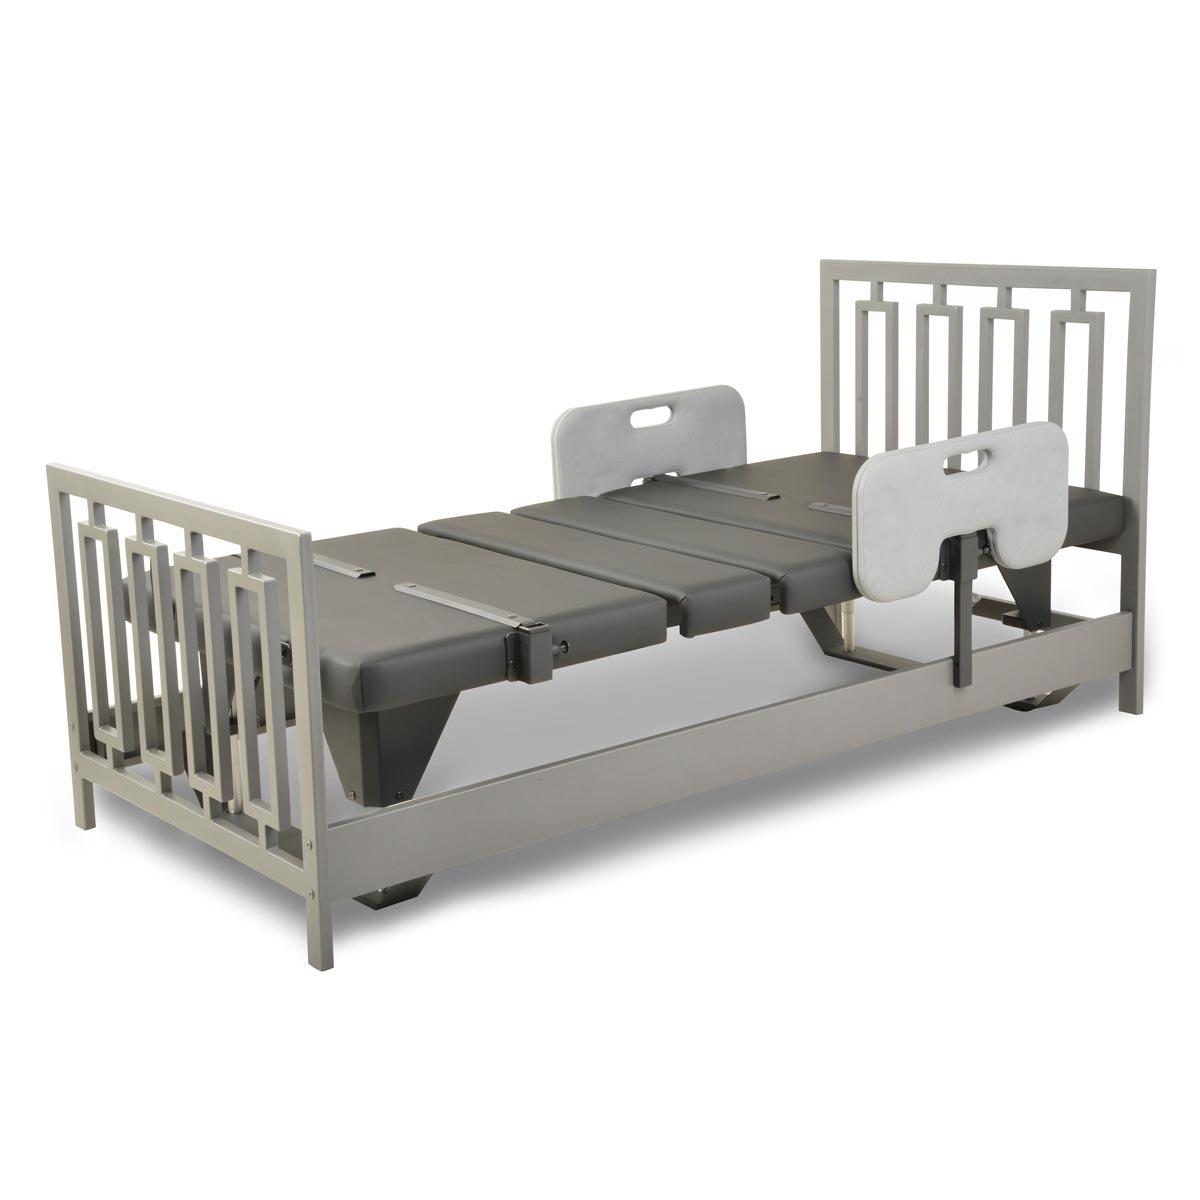 Assured Comfort Signature Series Hi-Lo Bed | Medicaleshop